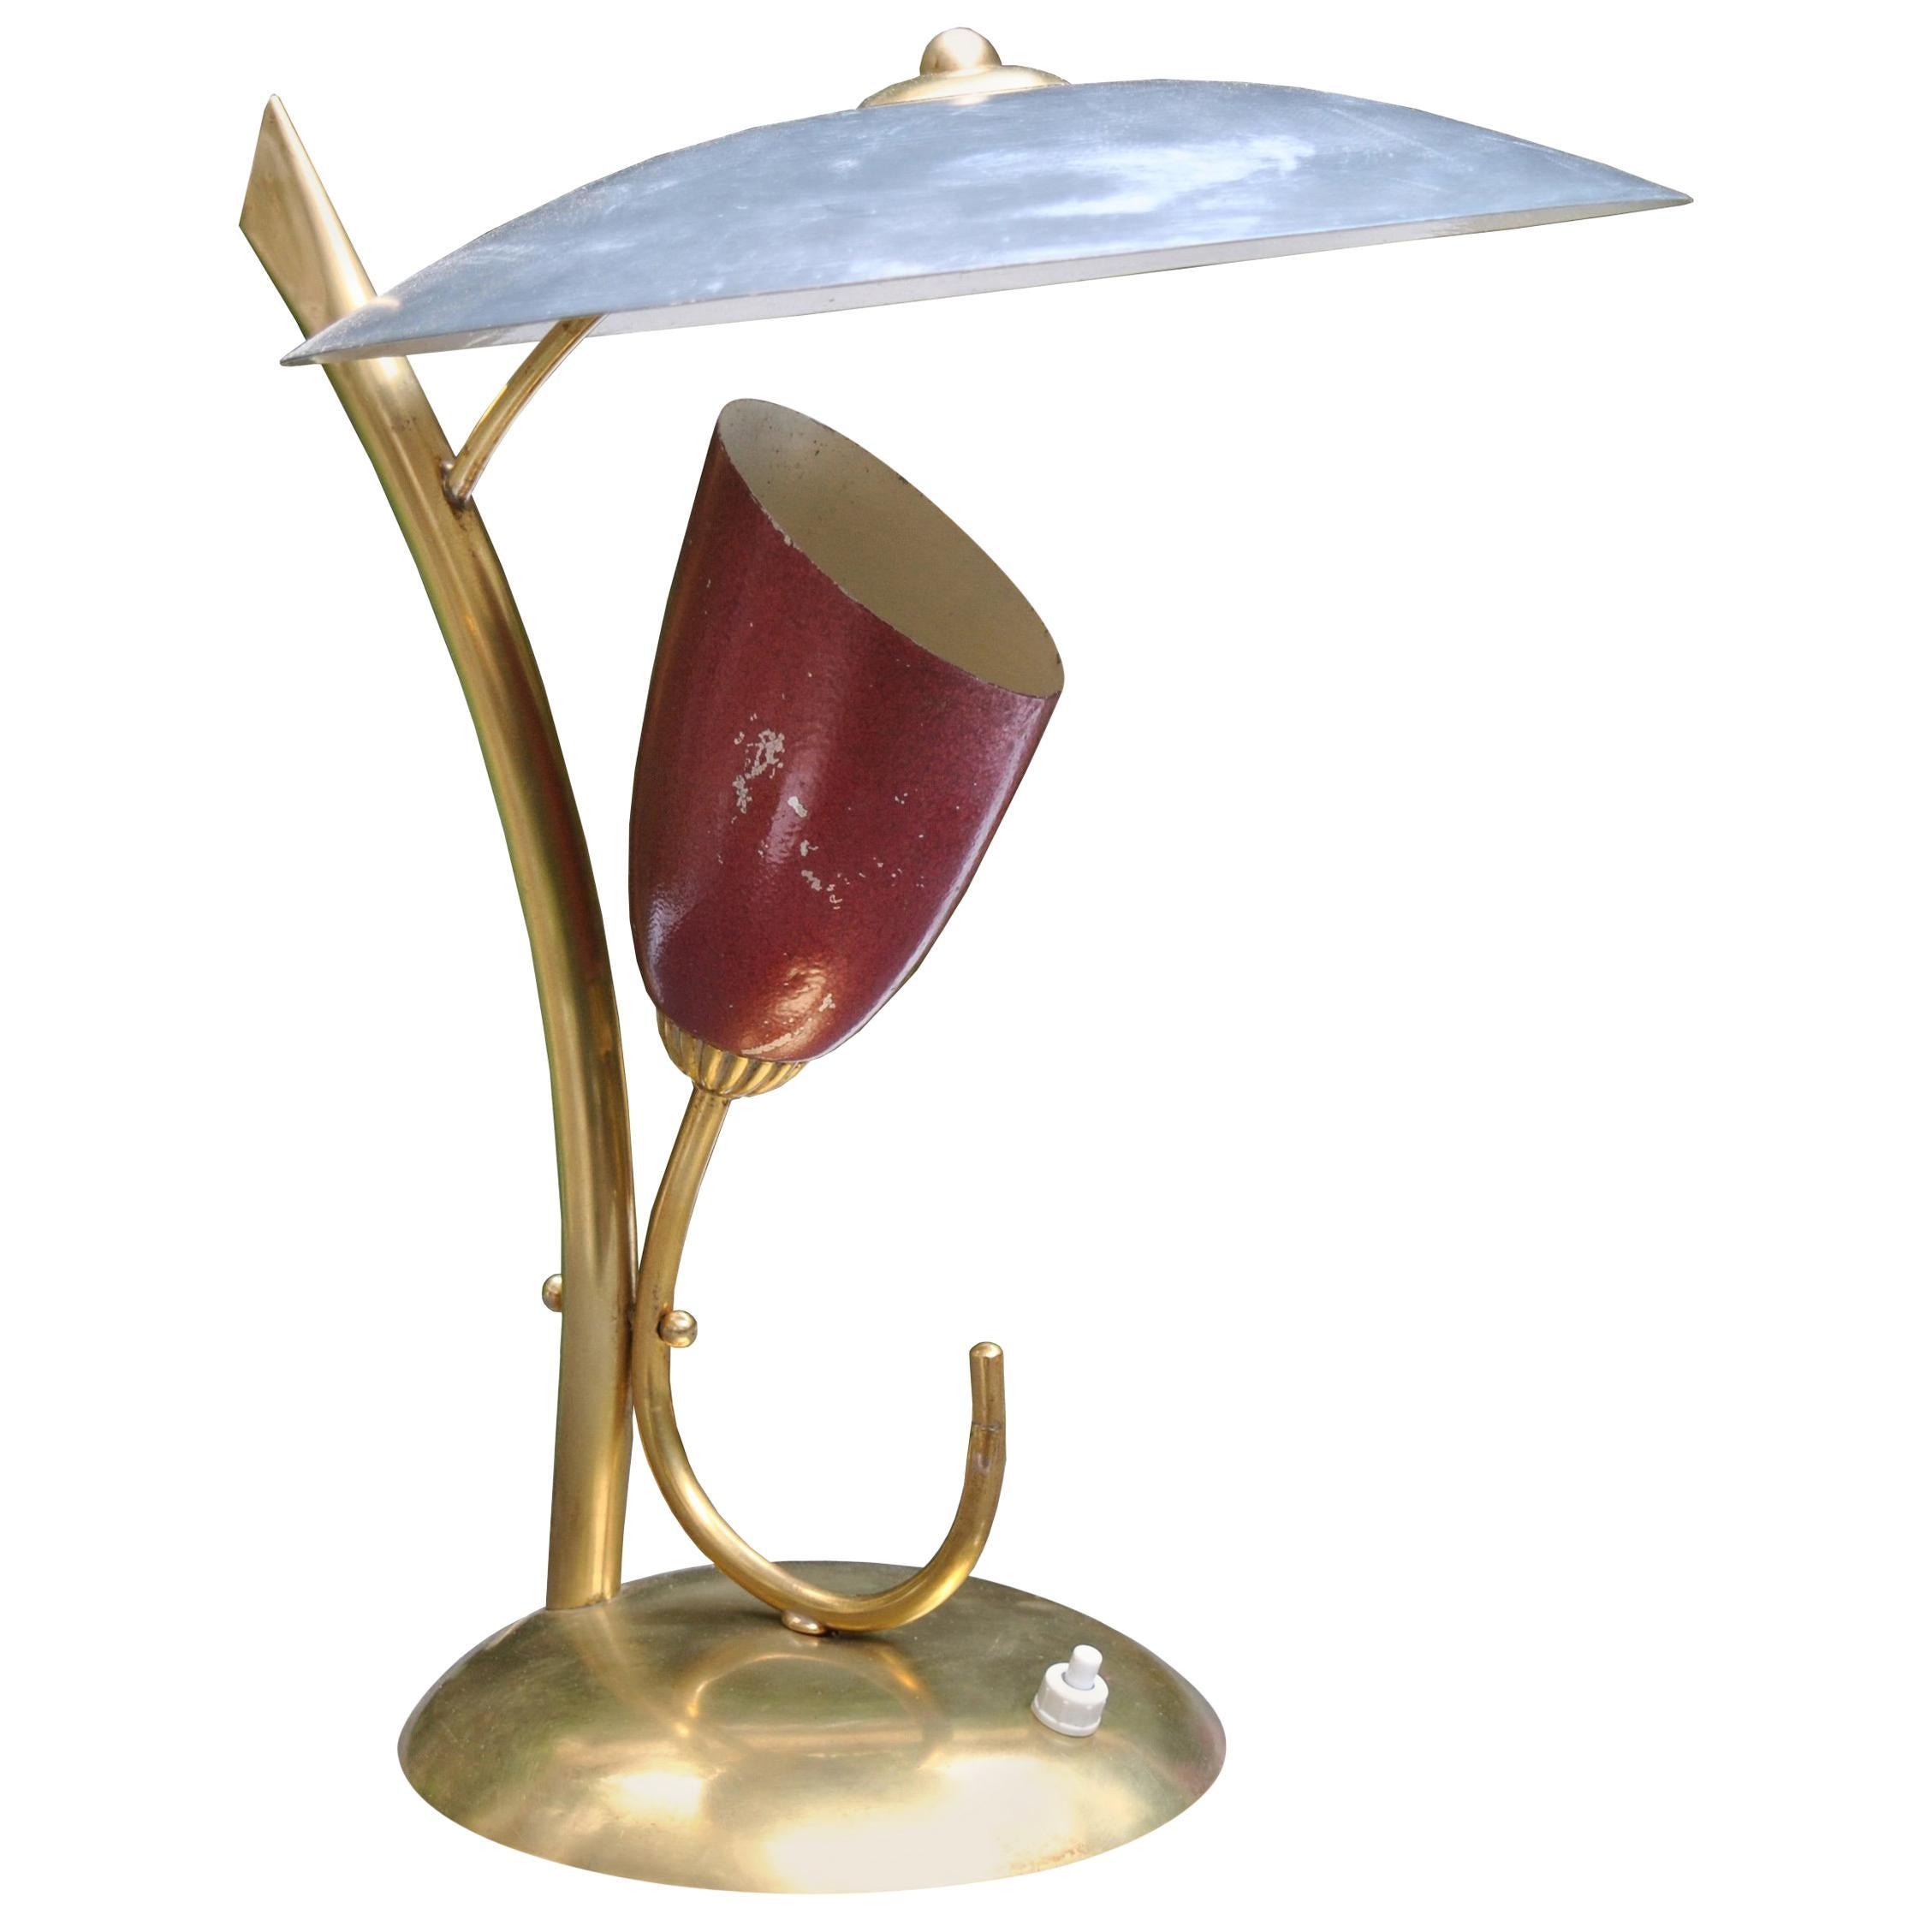 Italian Midcentury Table Lamp after Angelo Lelli for Arredoluce in Brass, 1950s